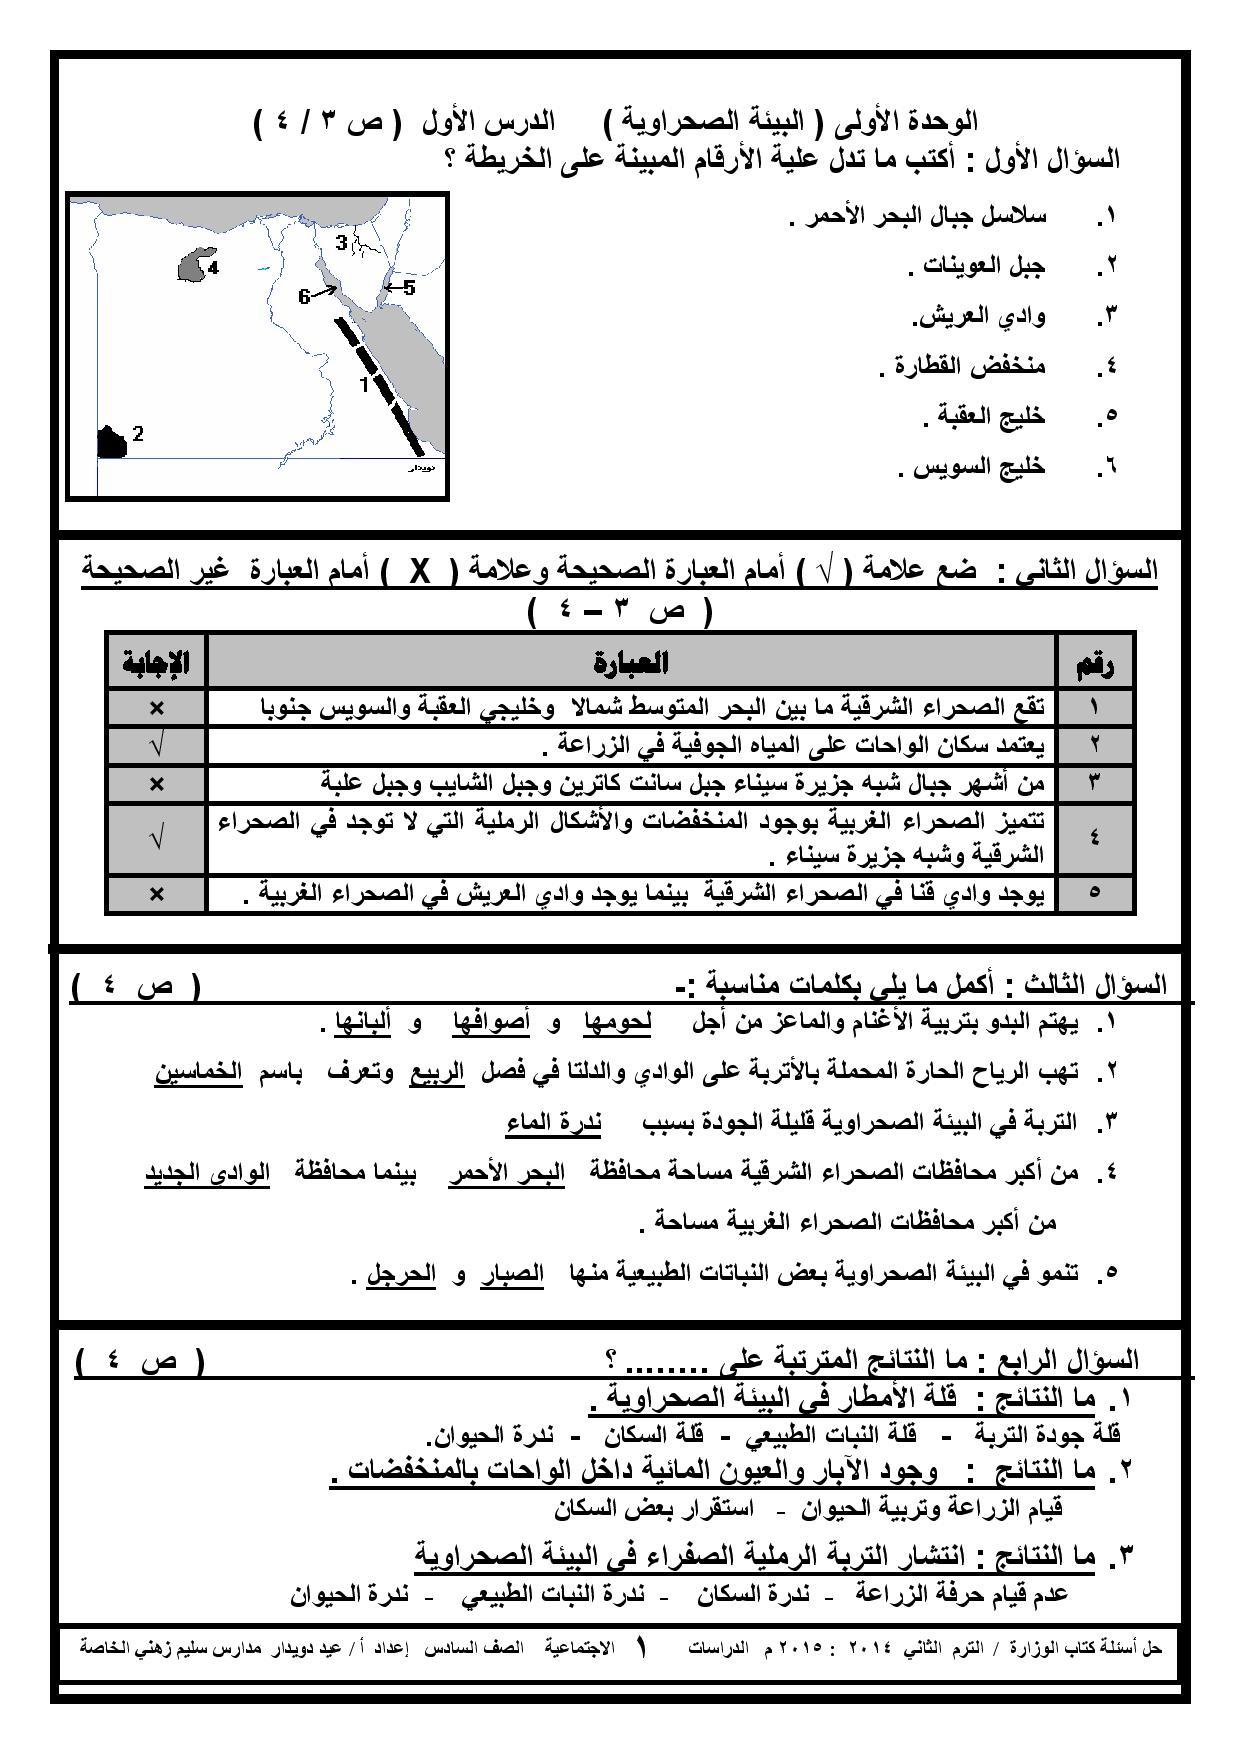 exam-eg.com_1462326080781.jpg